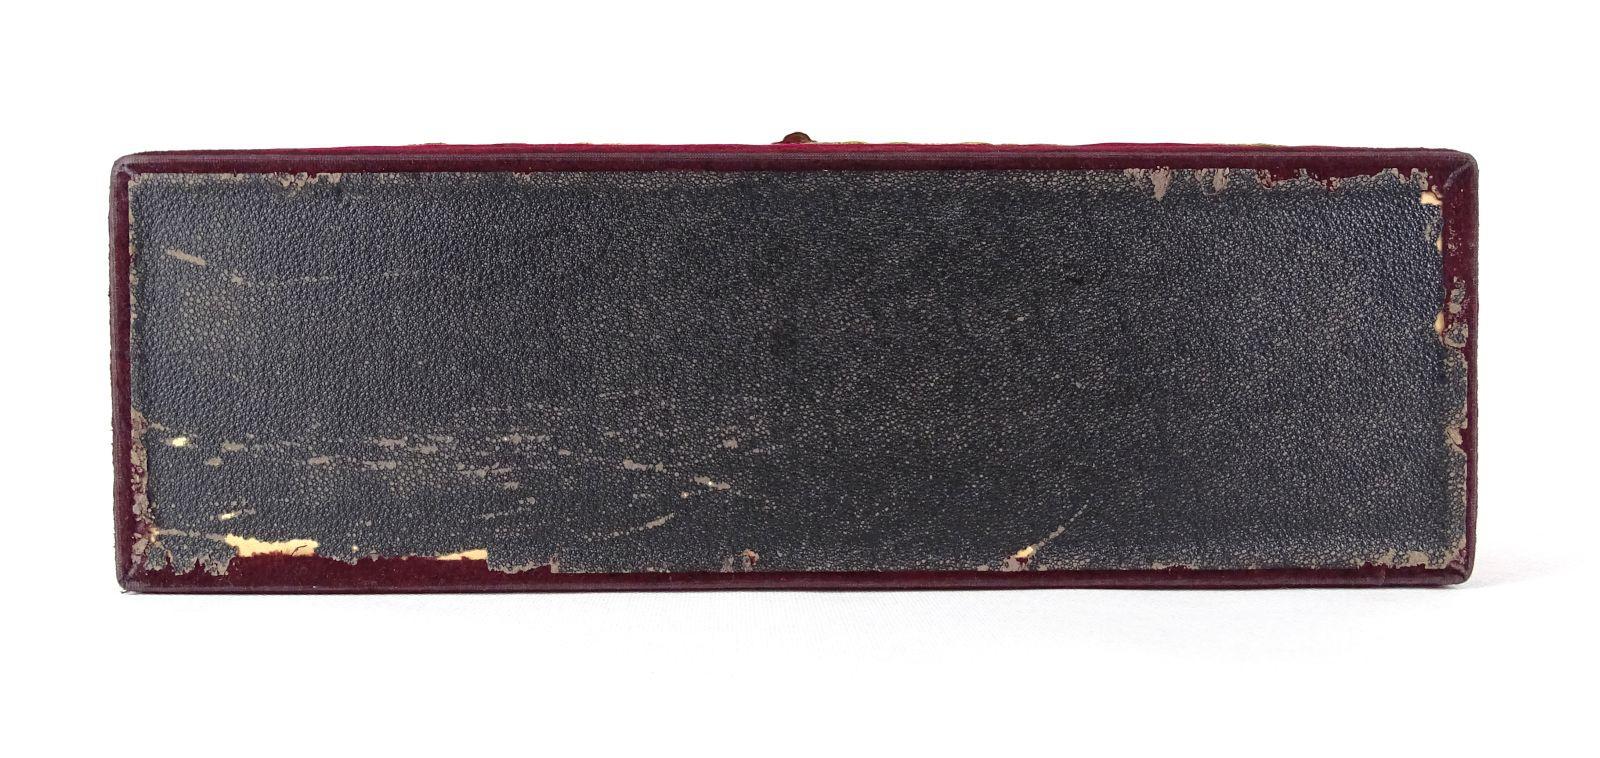 DSC02014.JPG (1600×758)